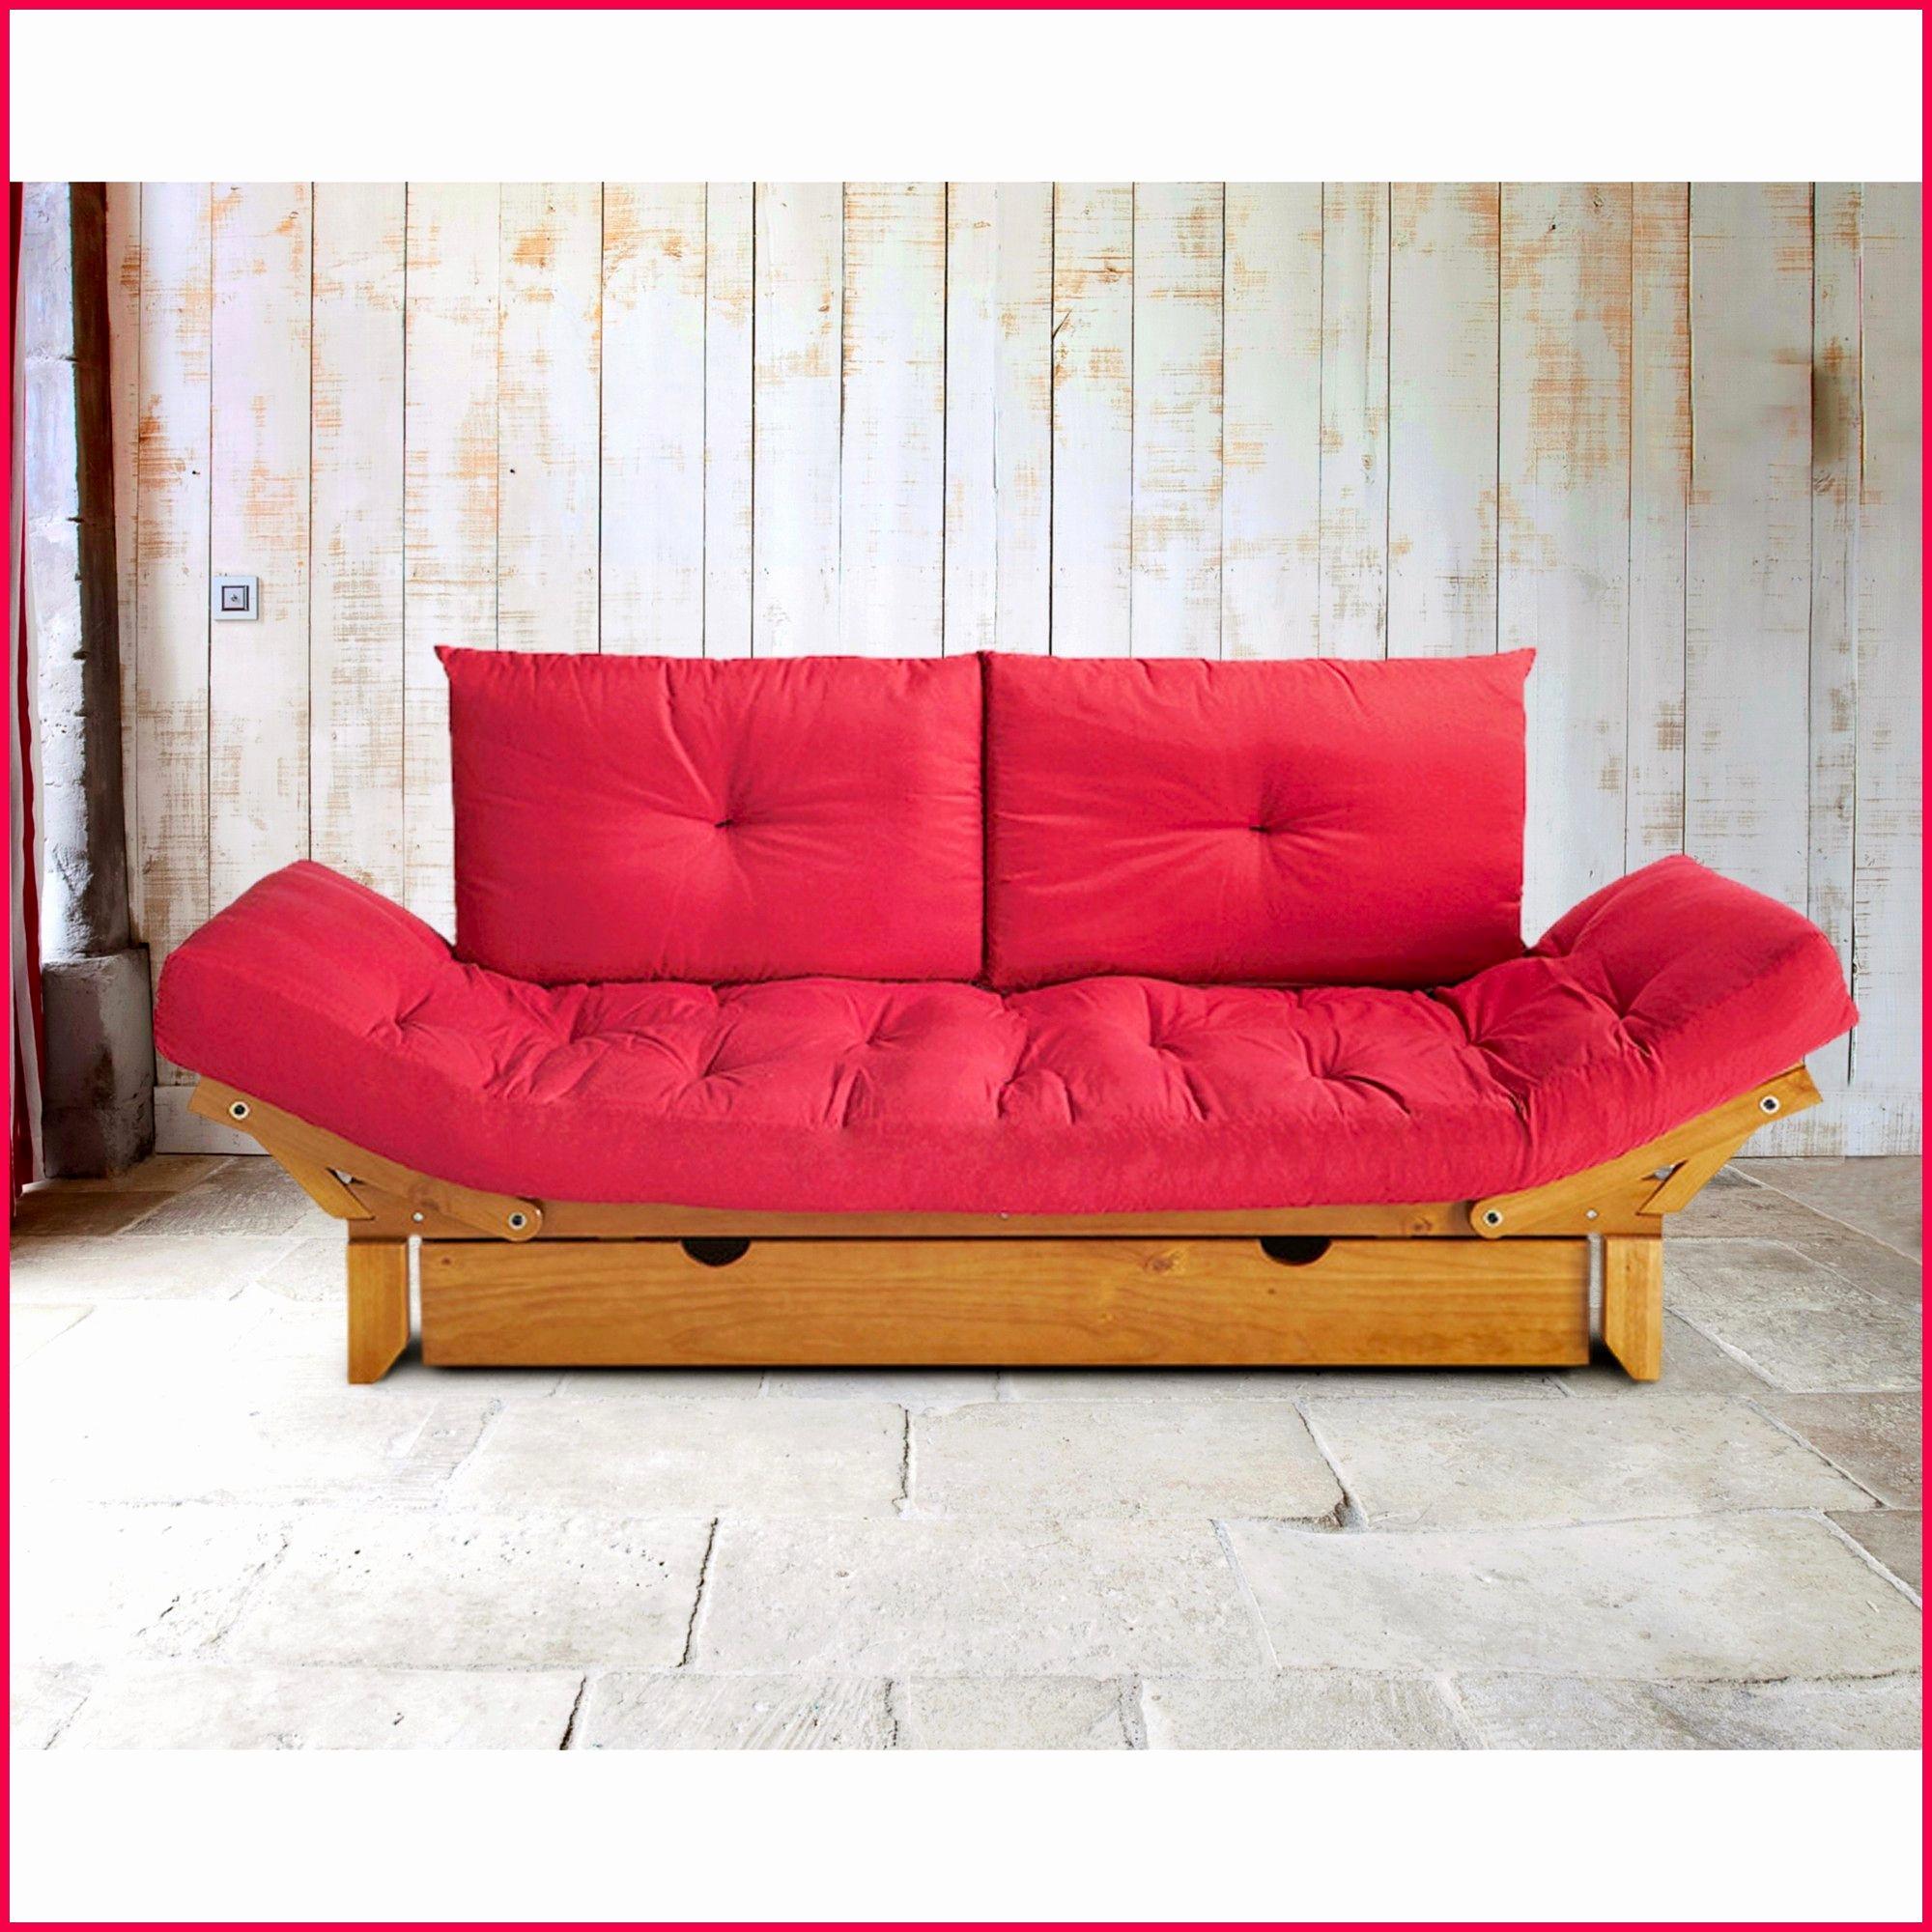 divan hemnes ikea meilleur de stock ikea canap convertible 2 places chamberlinphotos. Black Bedroom Furniture Sets. Home Design Ideas